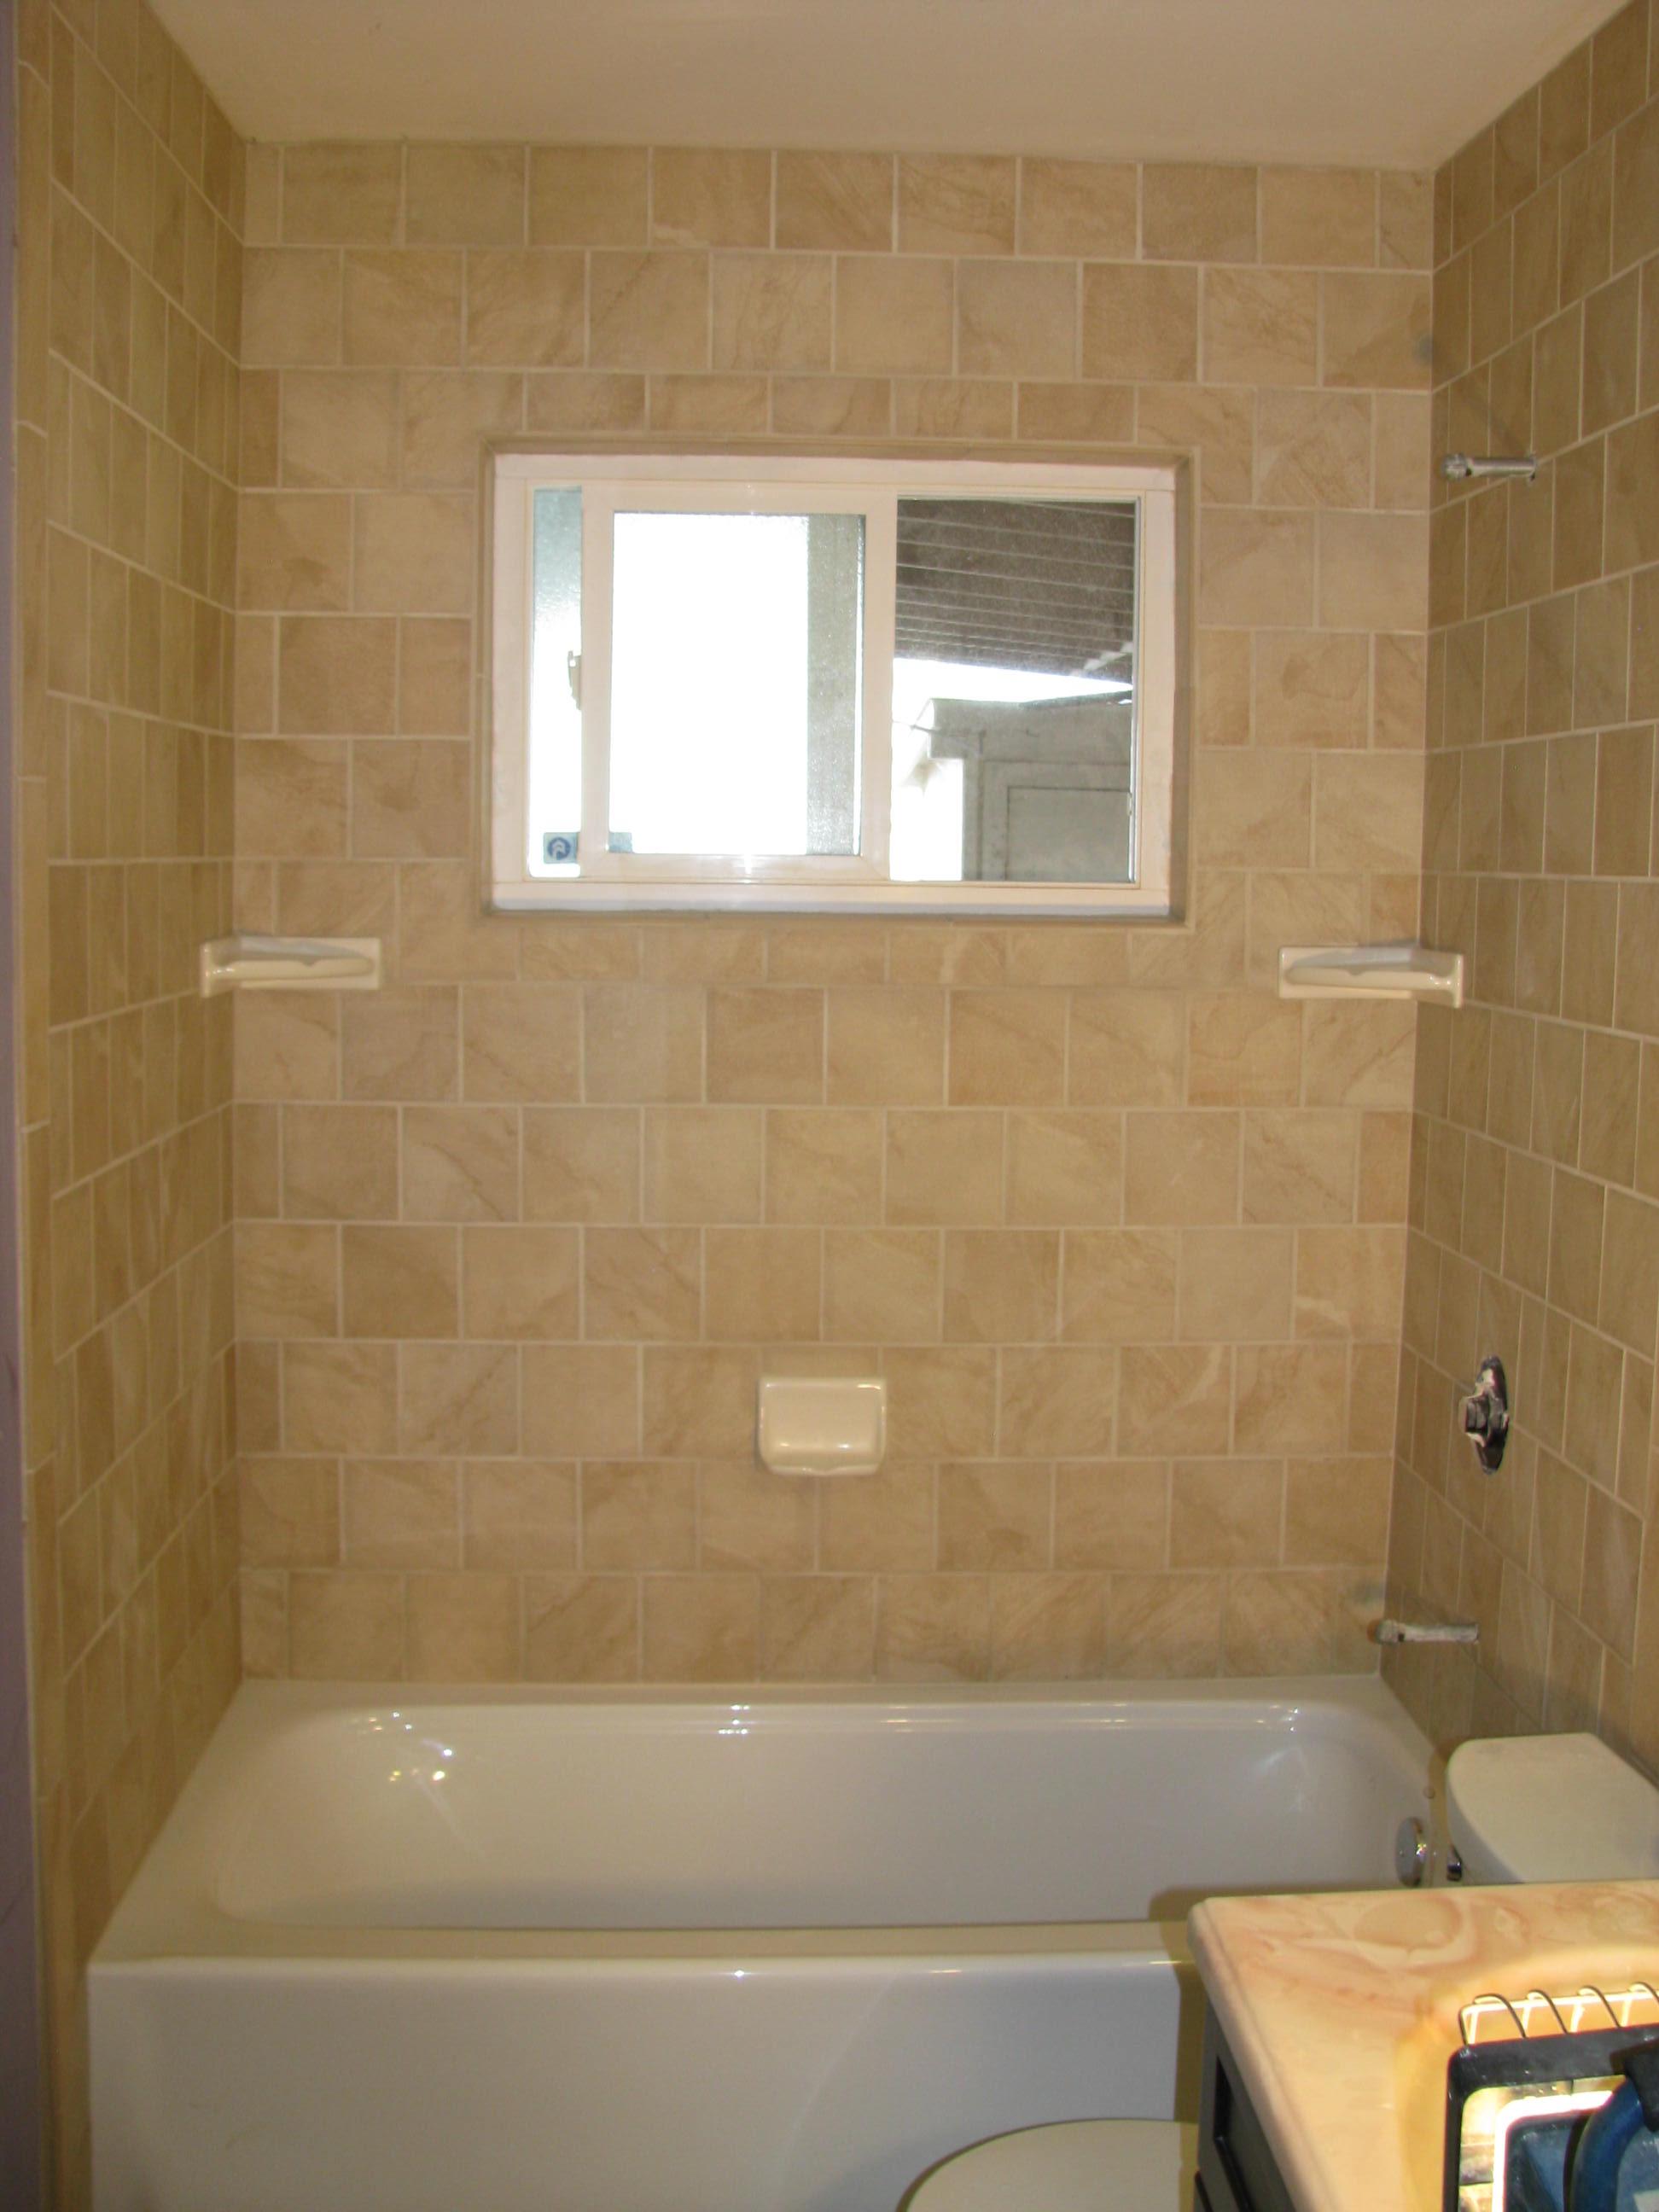 Entire Tub Shower Area.JPG